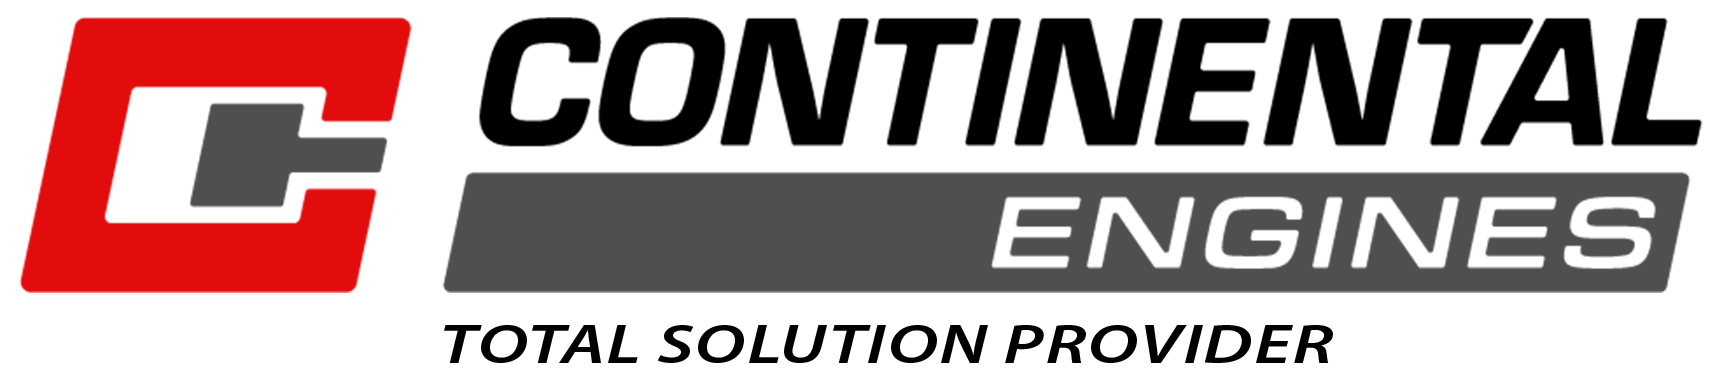 KOH69529